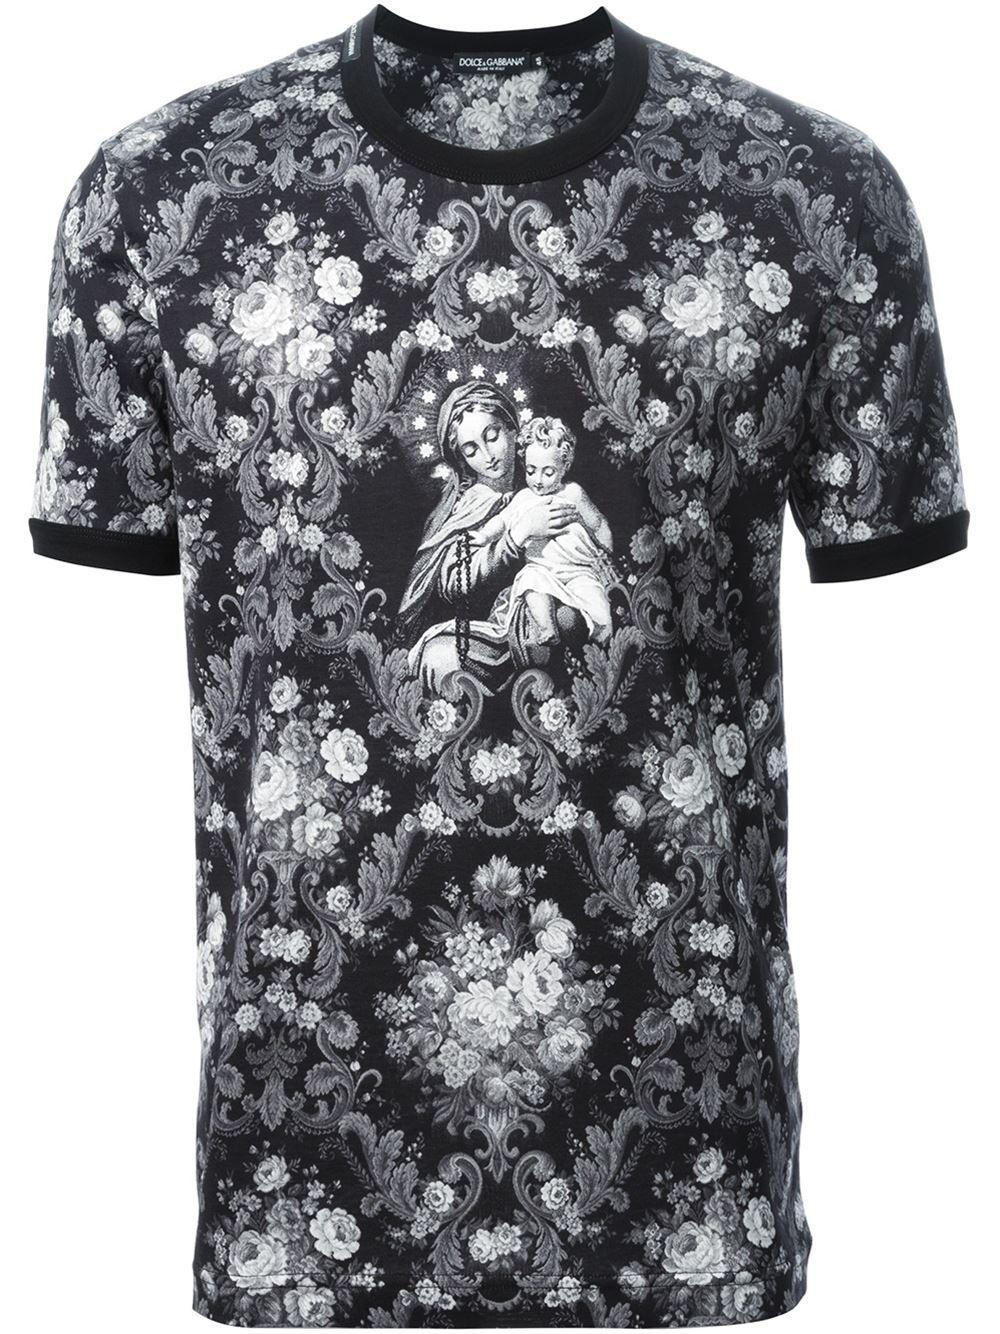 444e3eb7dd7e Dolce & gabbana Virgin Mary and Baby Jesus Print Cotton T-Shirt ...